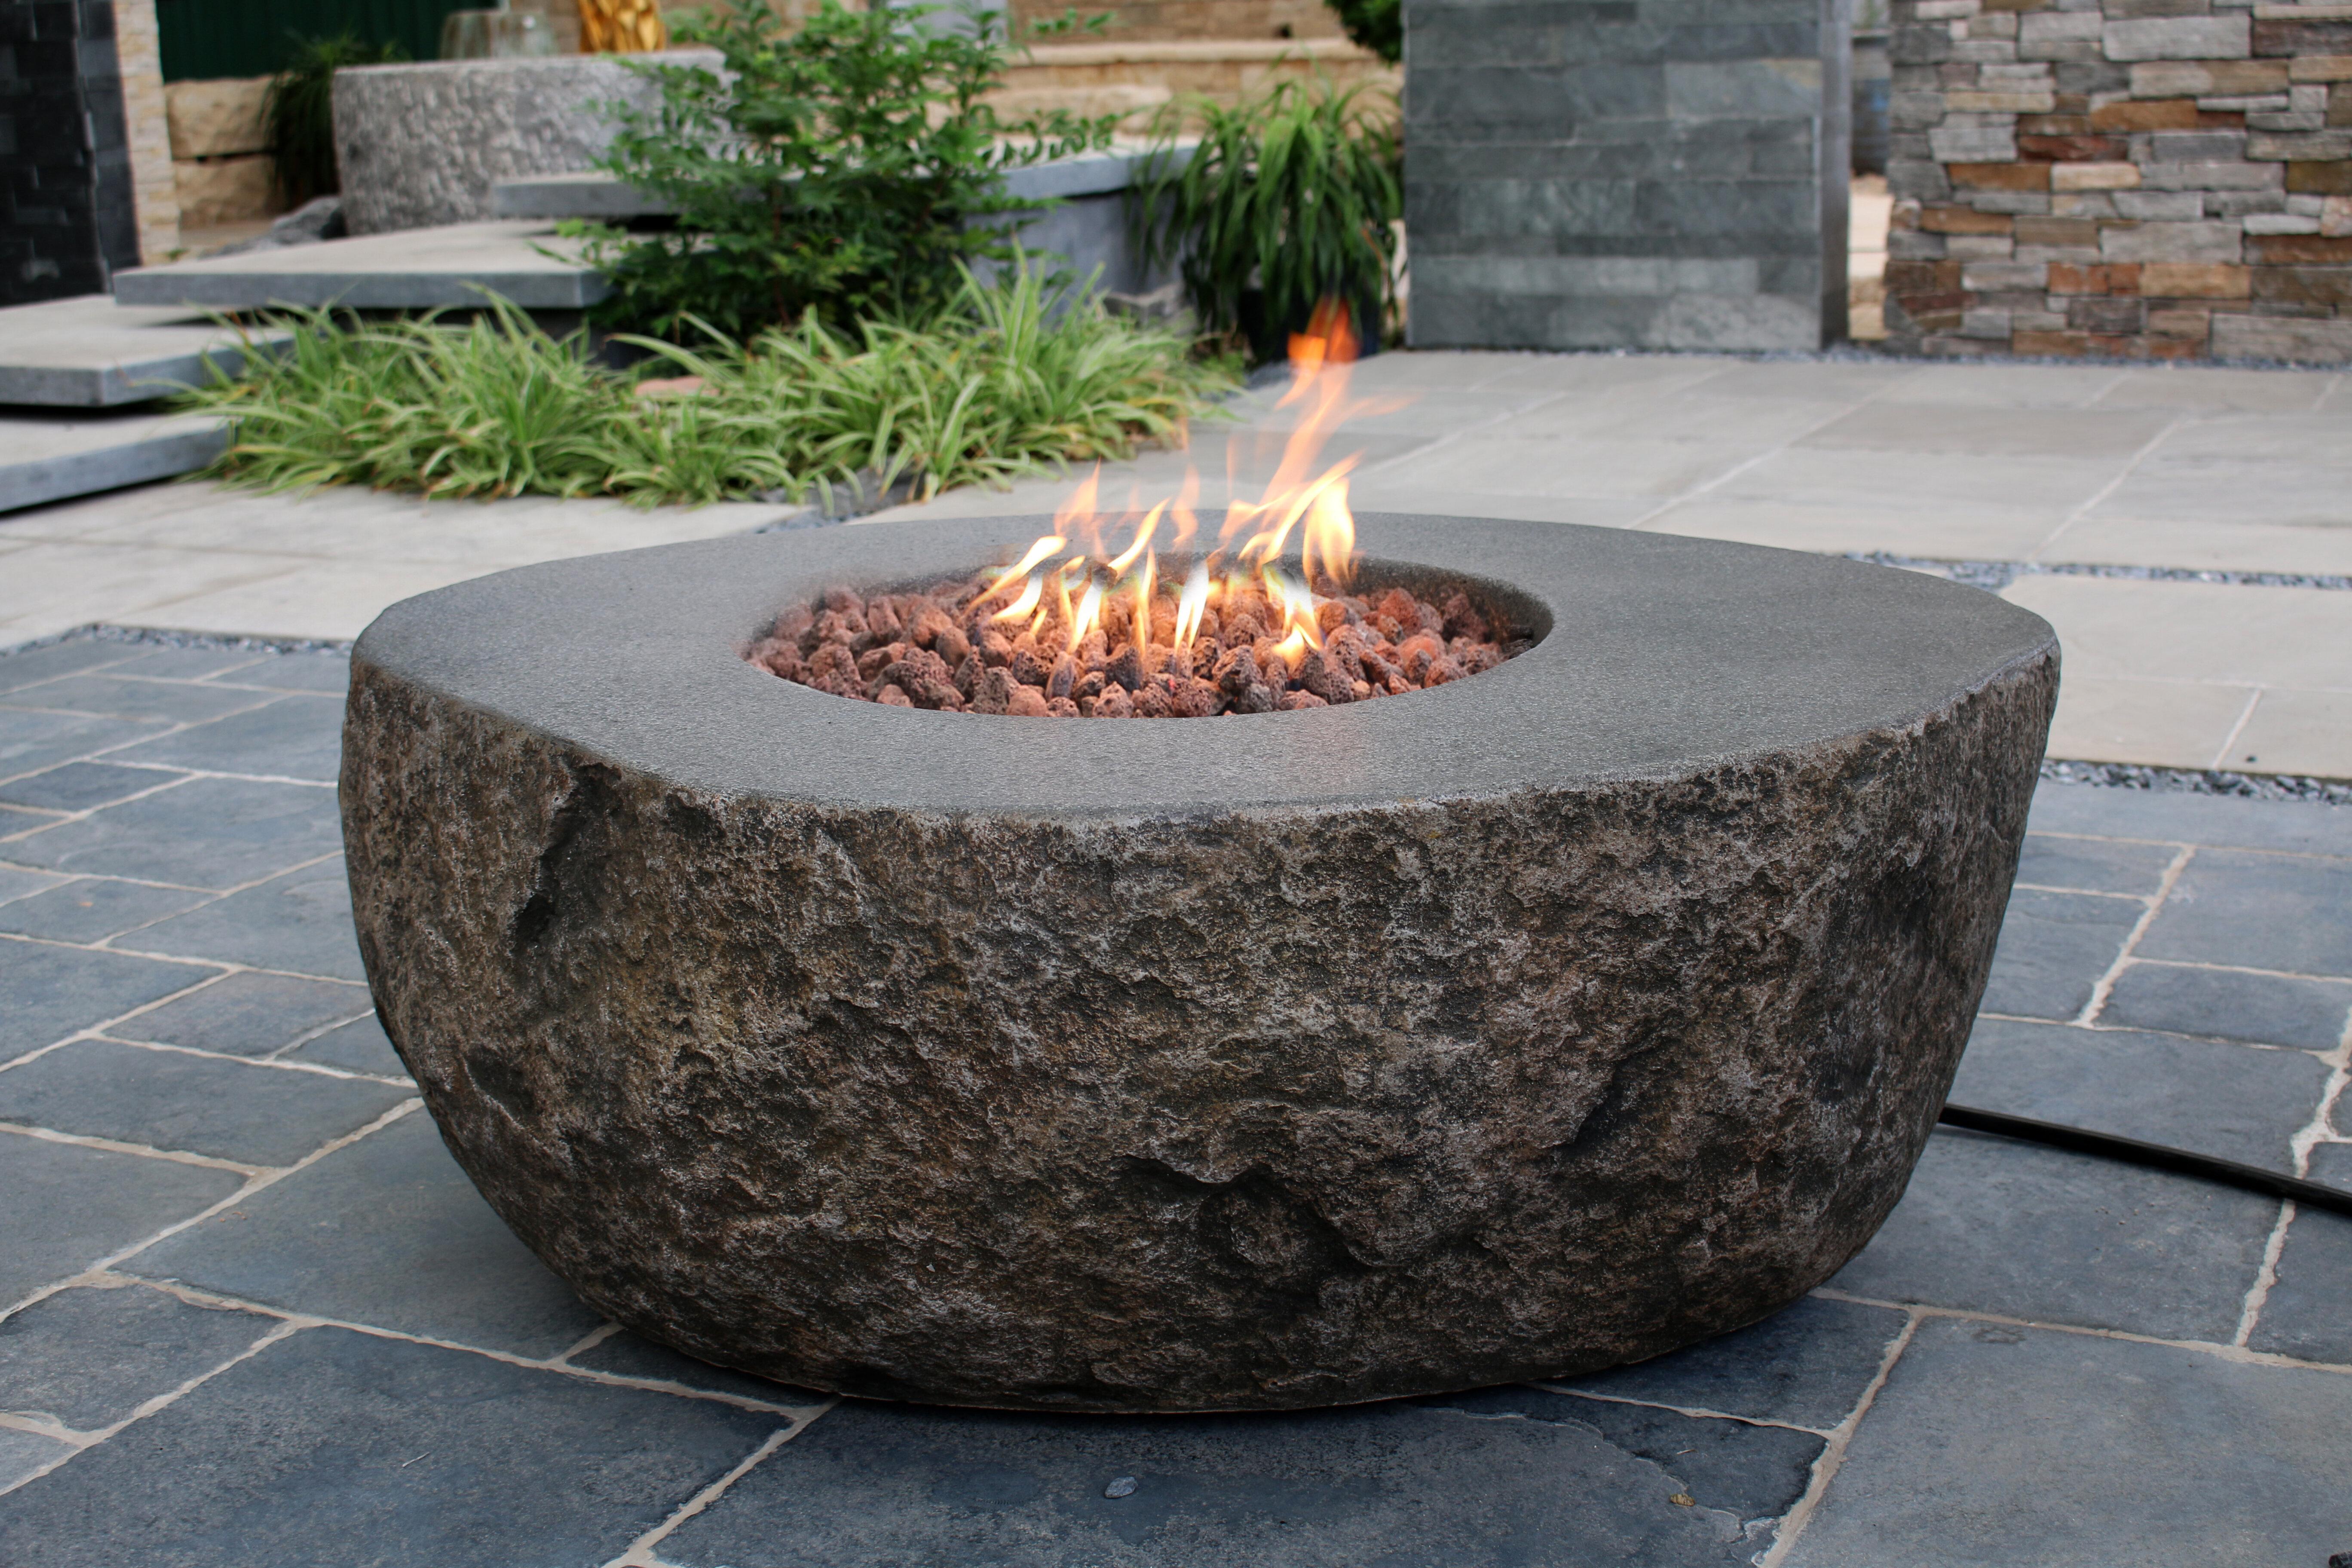 Elementi Boulder Concrete Propane Natural Gas Fire Pit Table Reviews